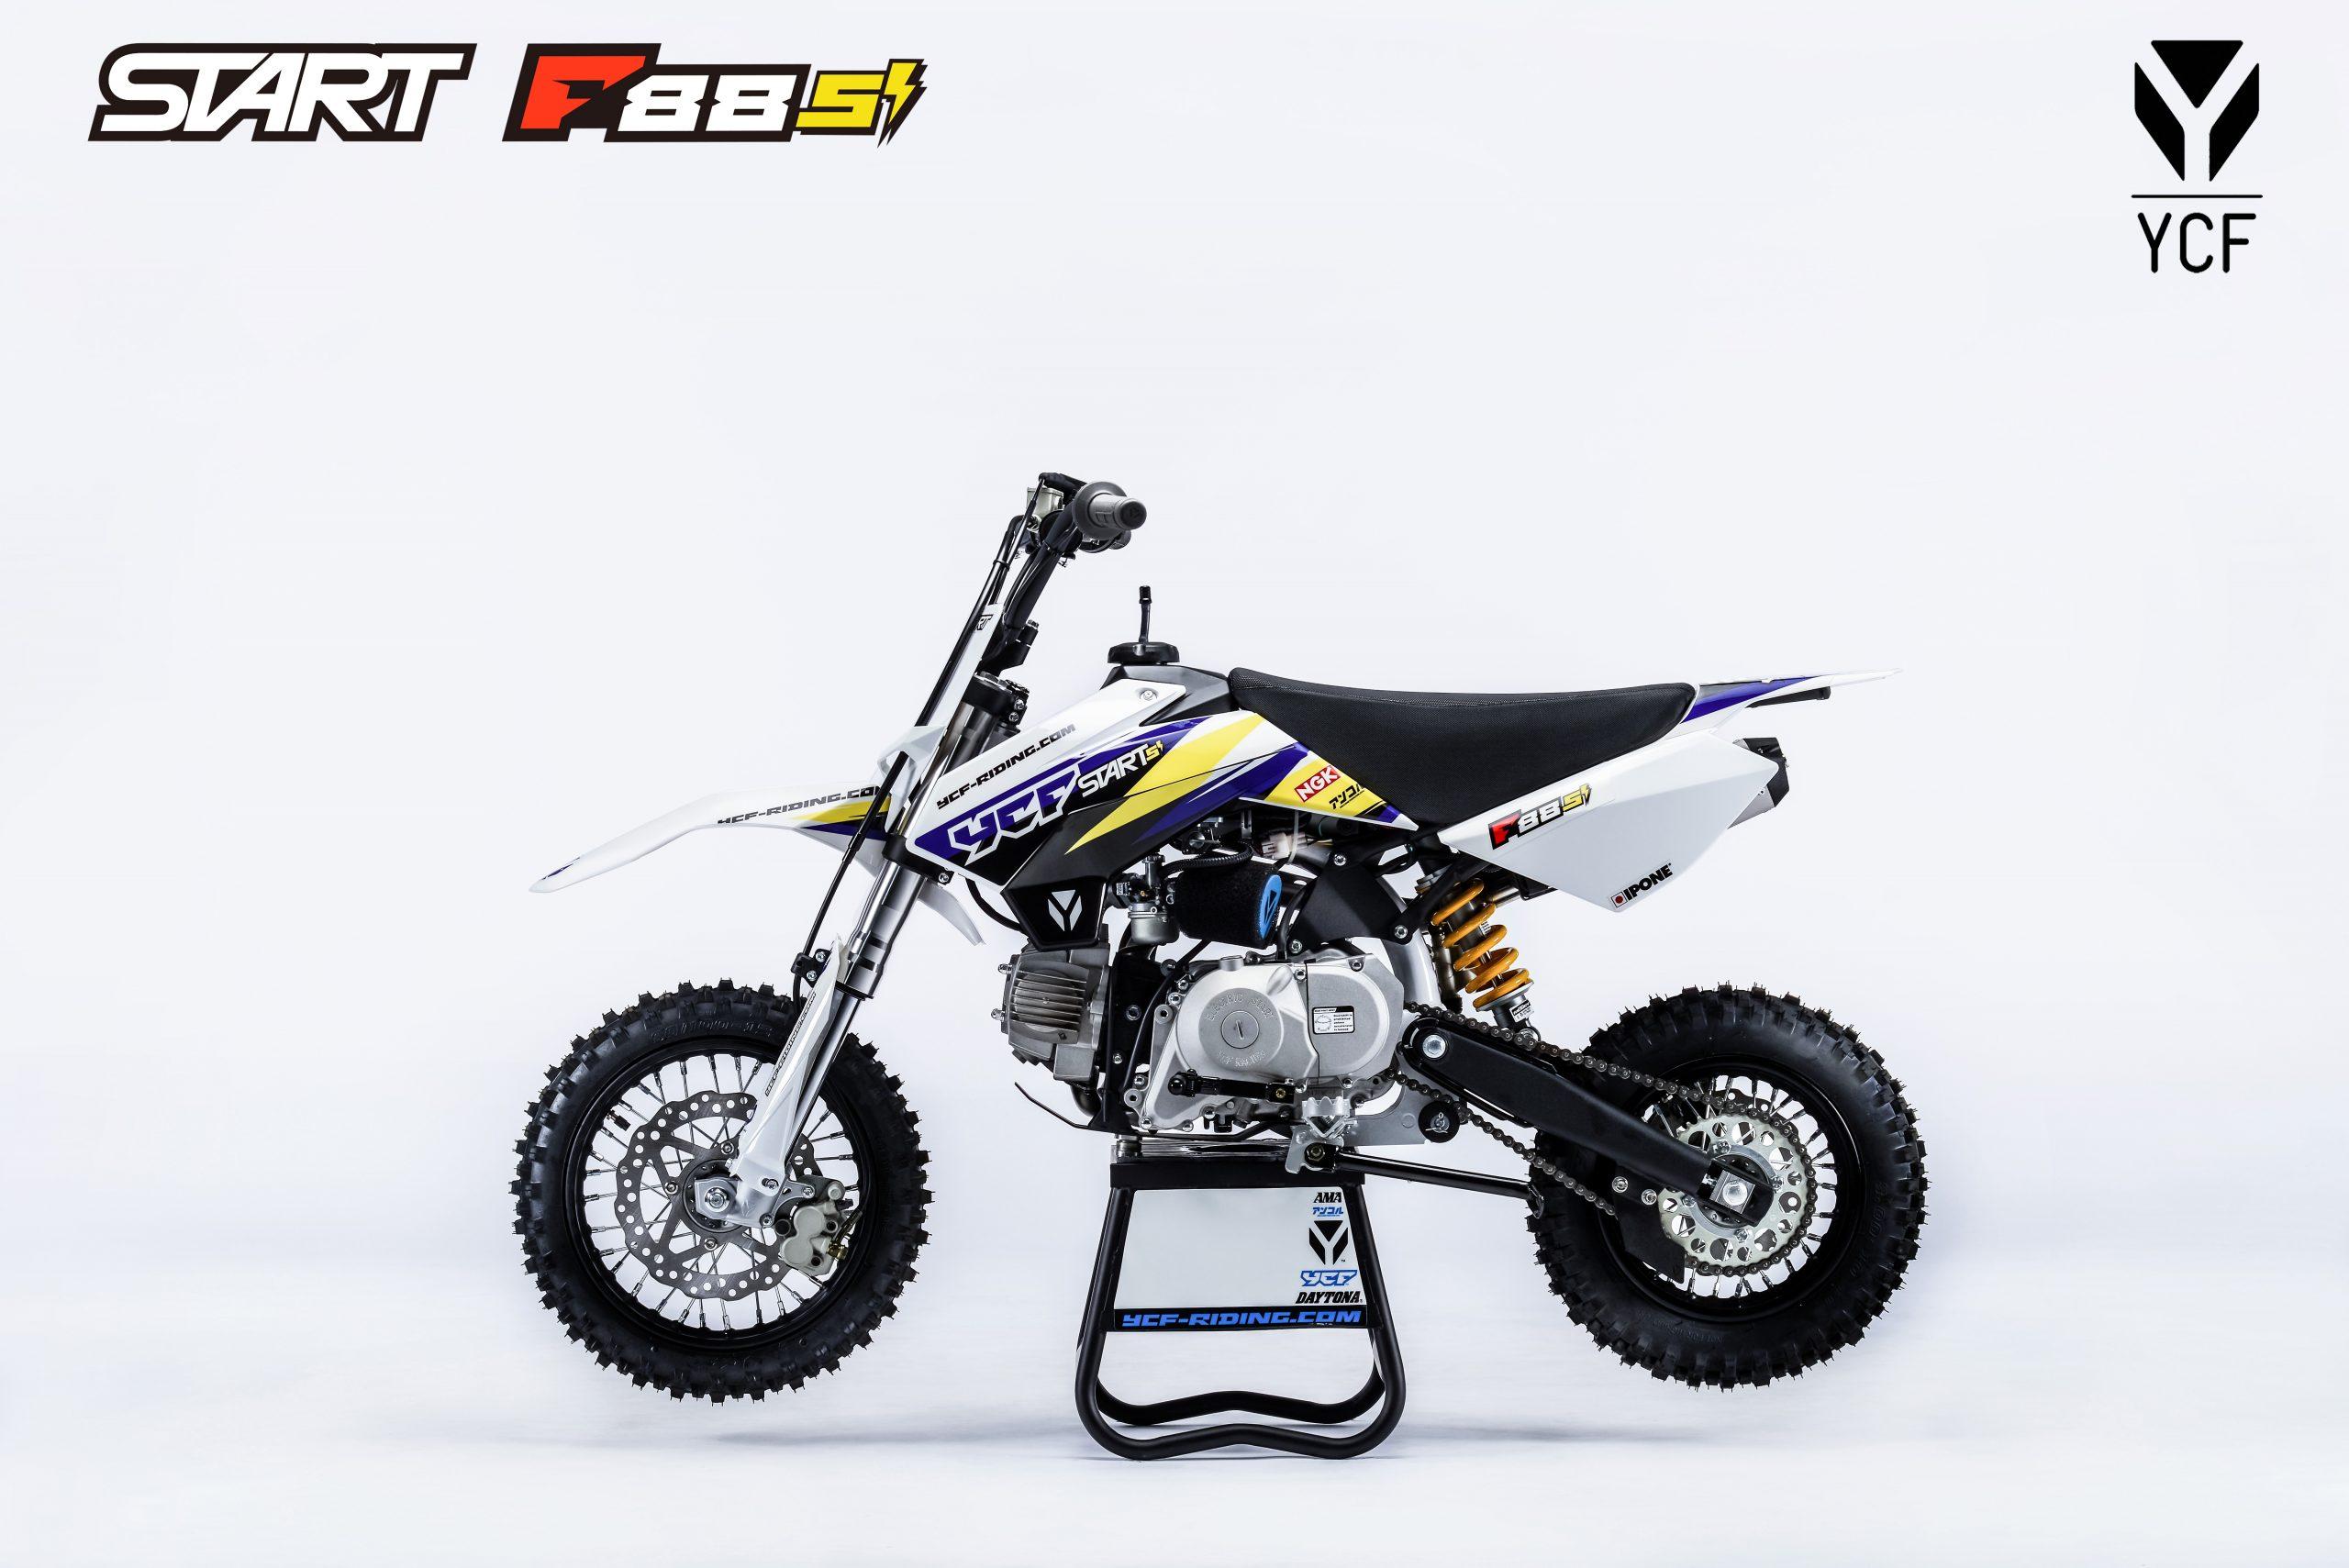 ПИТБАЙК YCF START F88SE 2021  Артмото - купить квадроцикл в украине и харькове, мотоцикл, снегоход, скутер, мопед, электромобиль